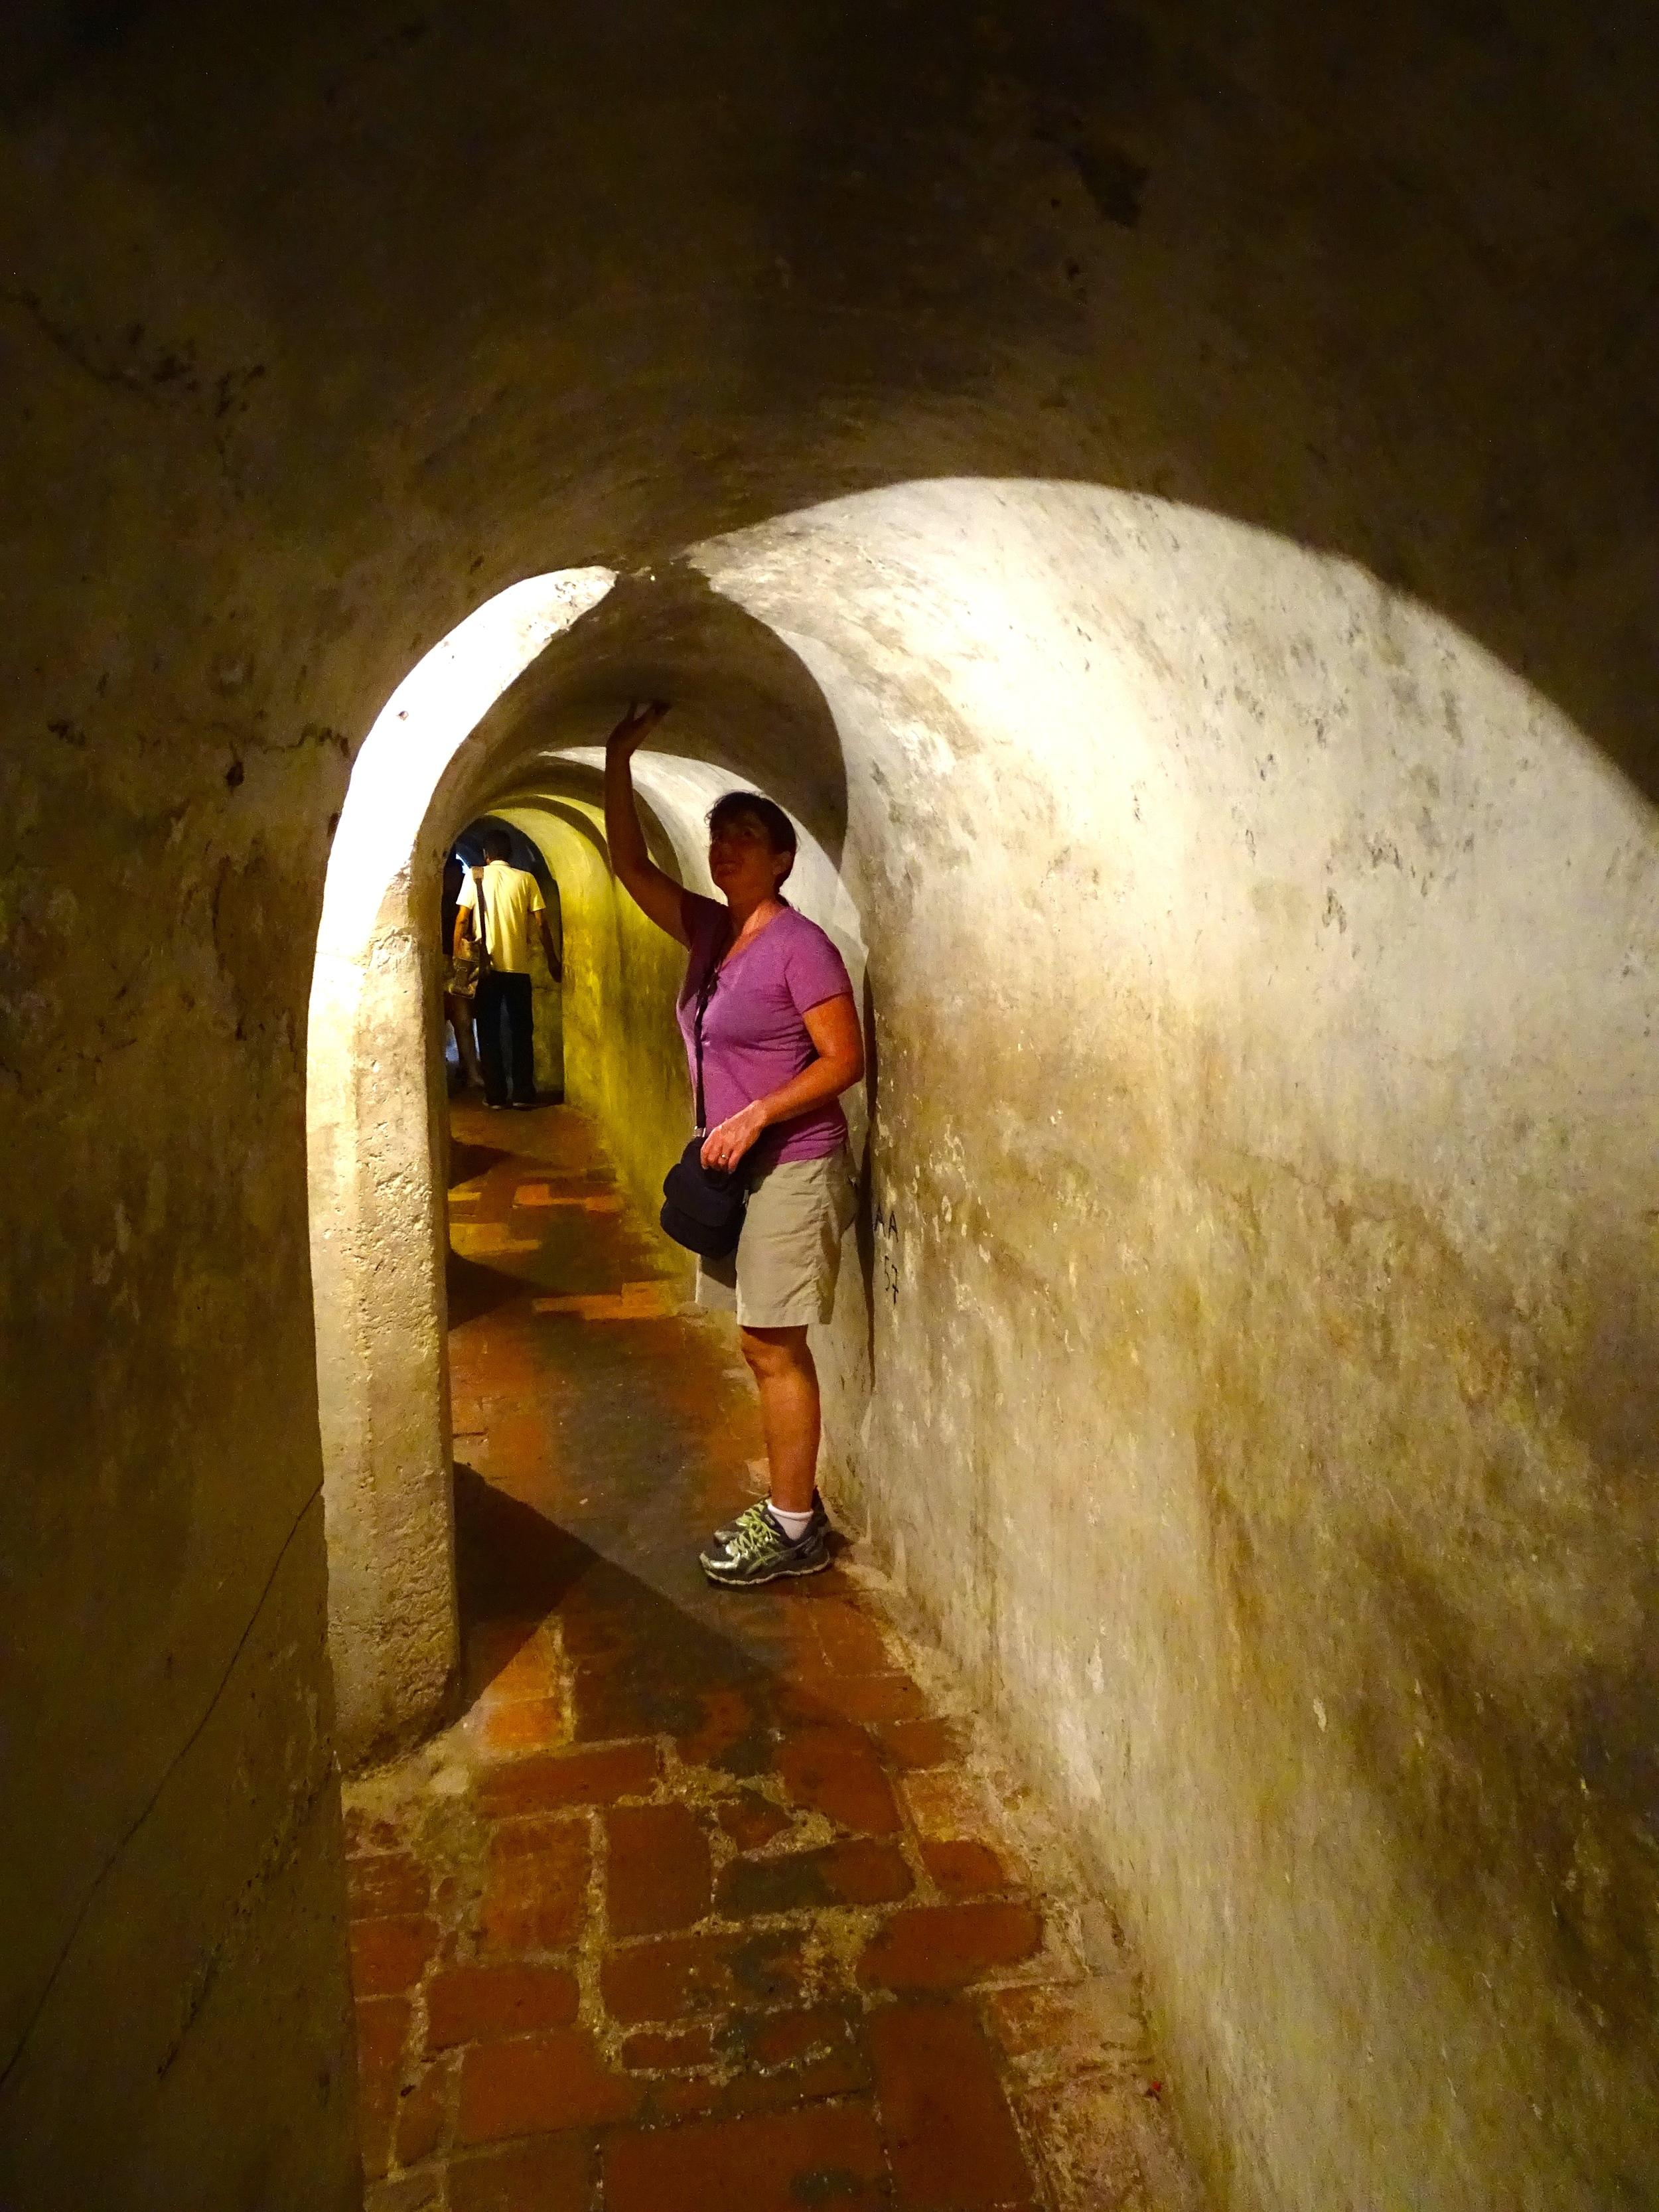 Short tunnels ran throughout.